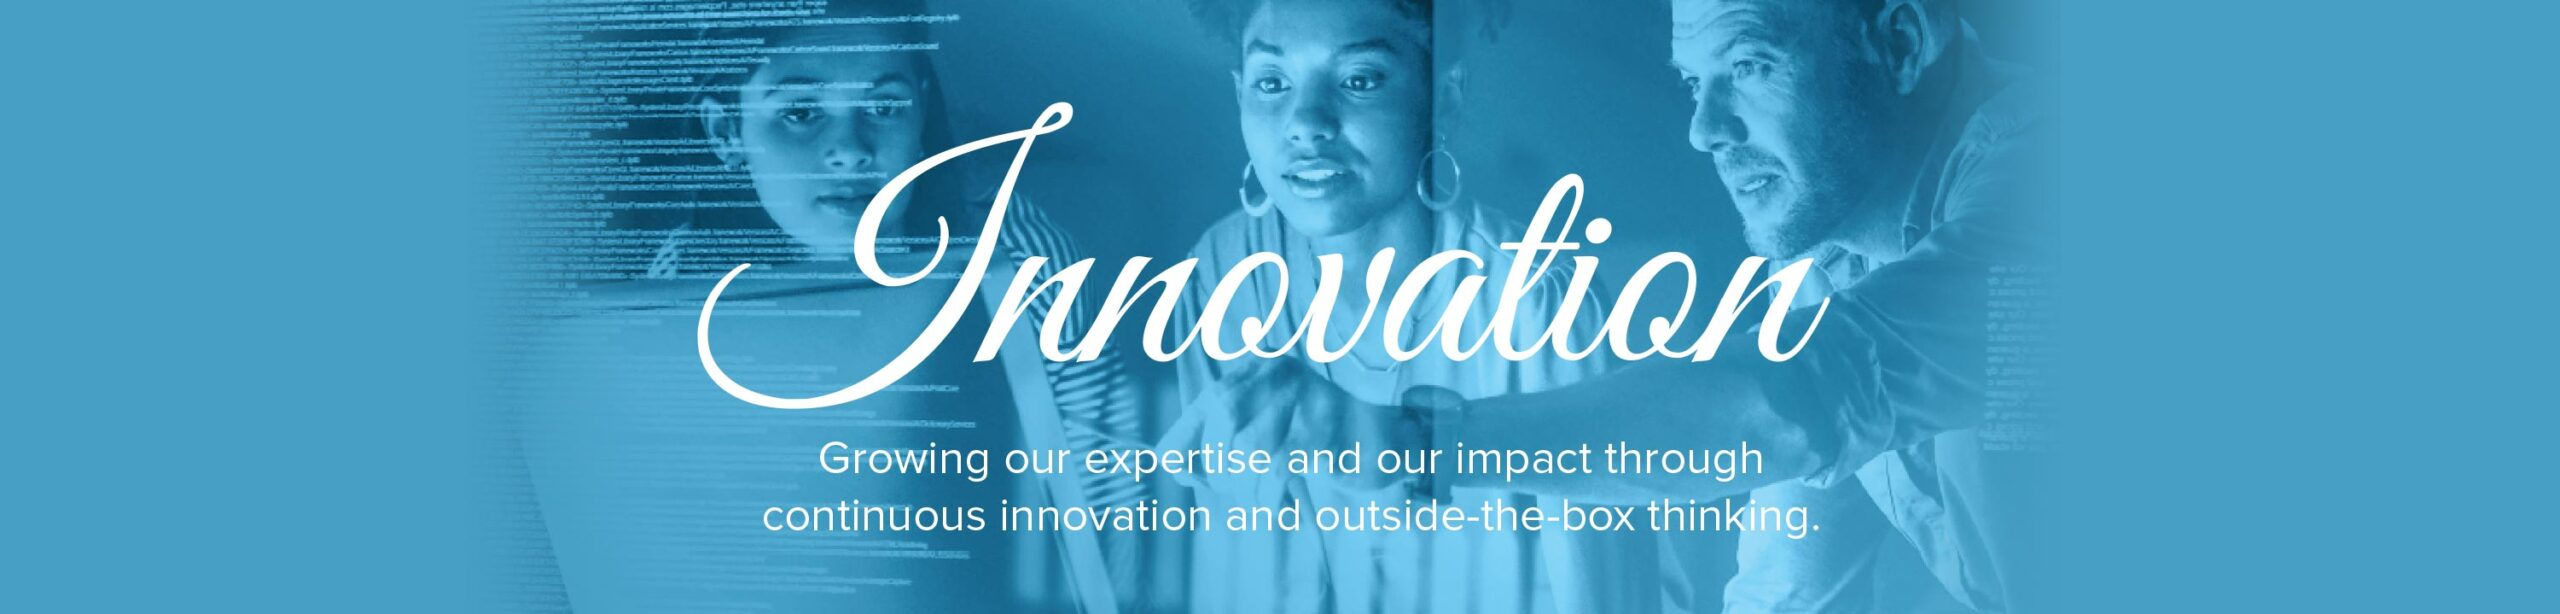 Core Value - Innovation